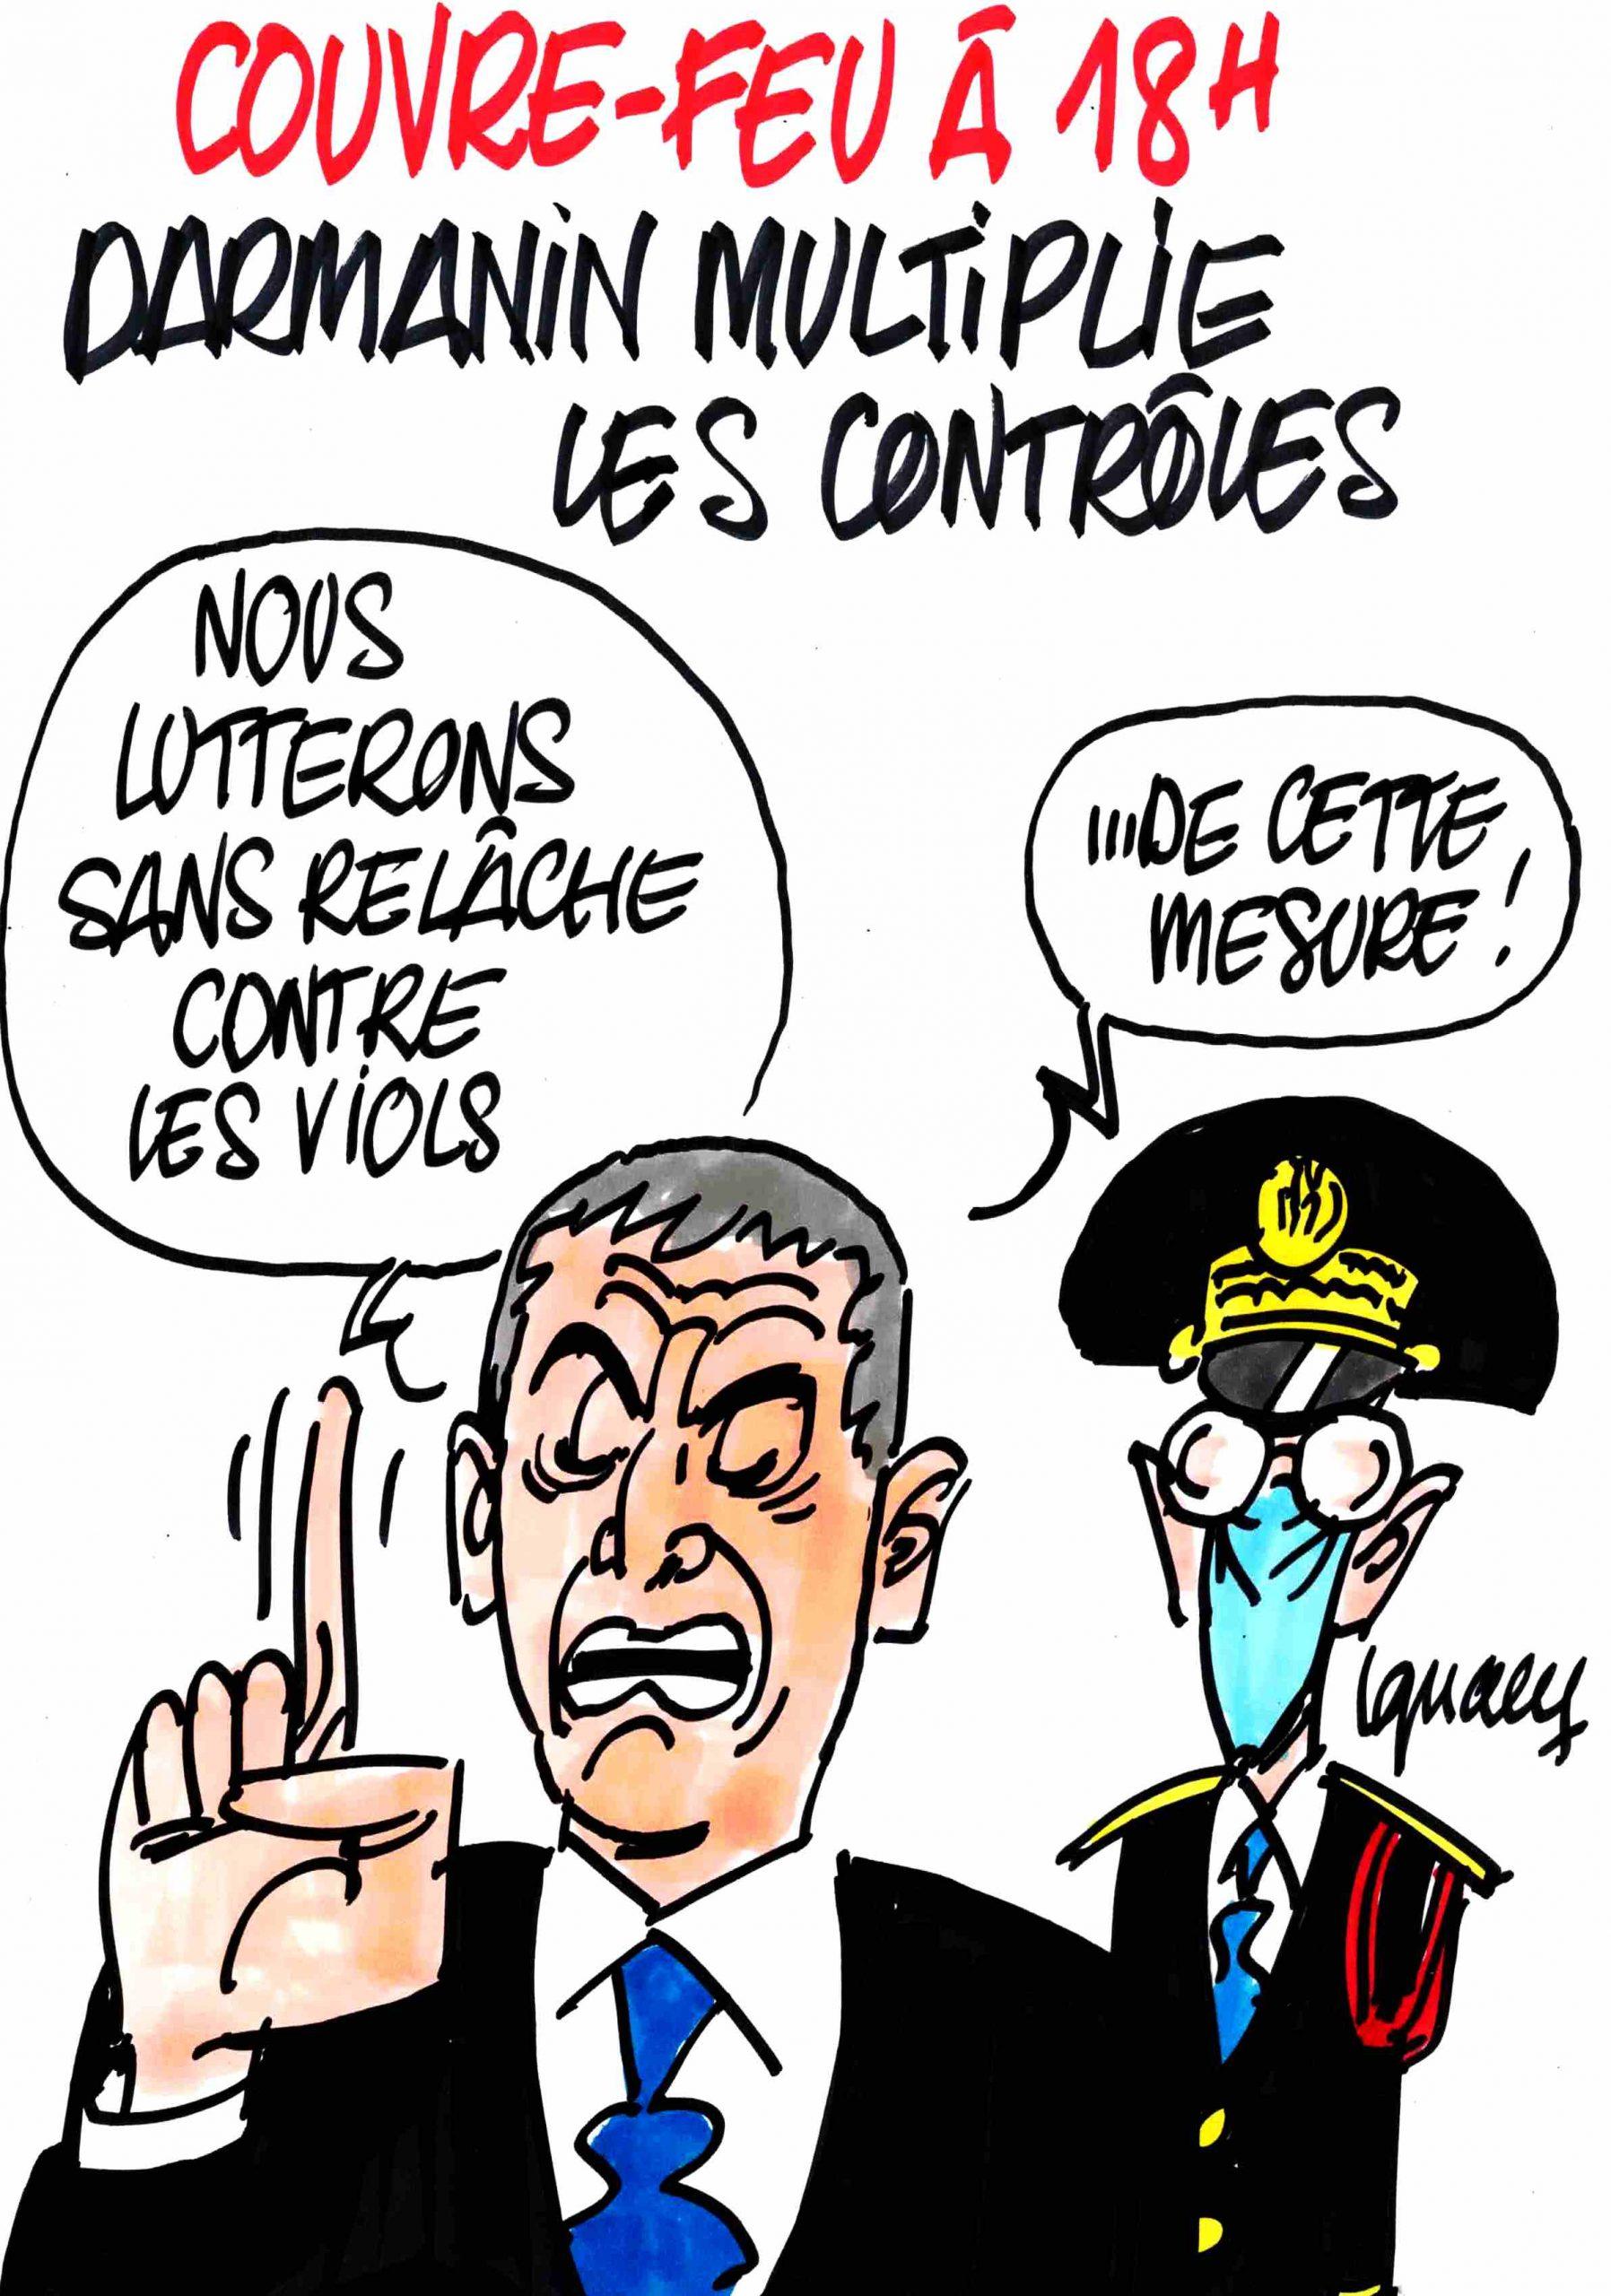 Ignace - Couvre-feu : Darmanin multiplie les contrôles